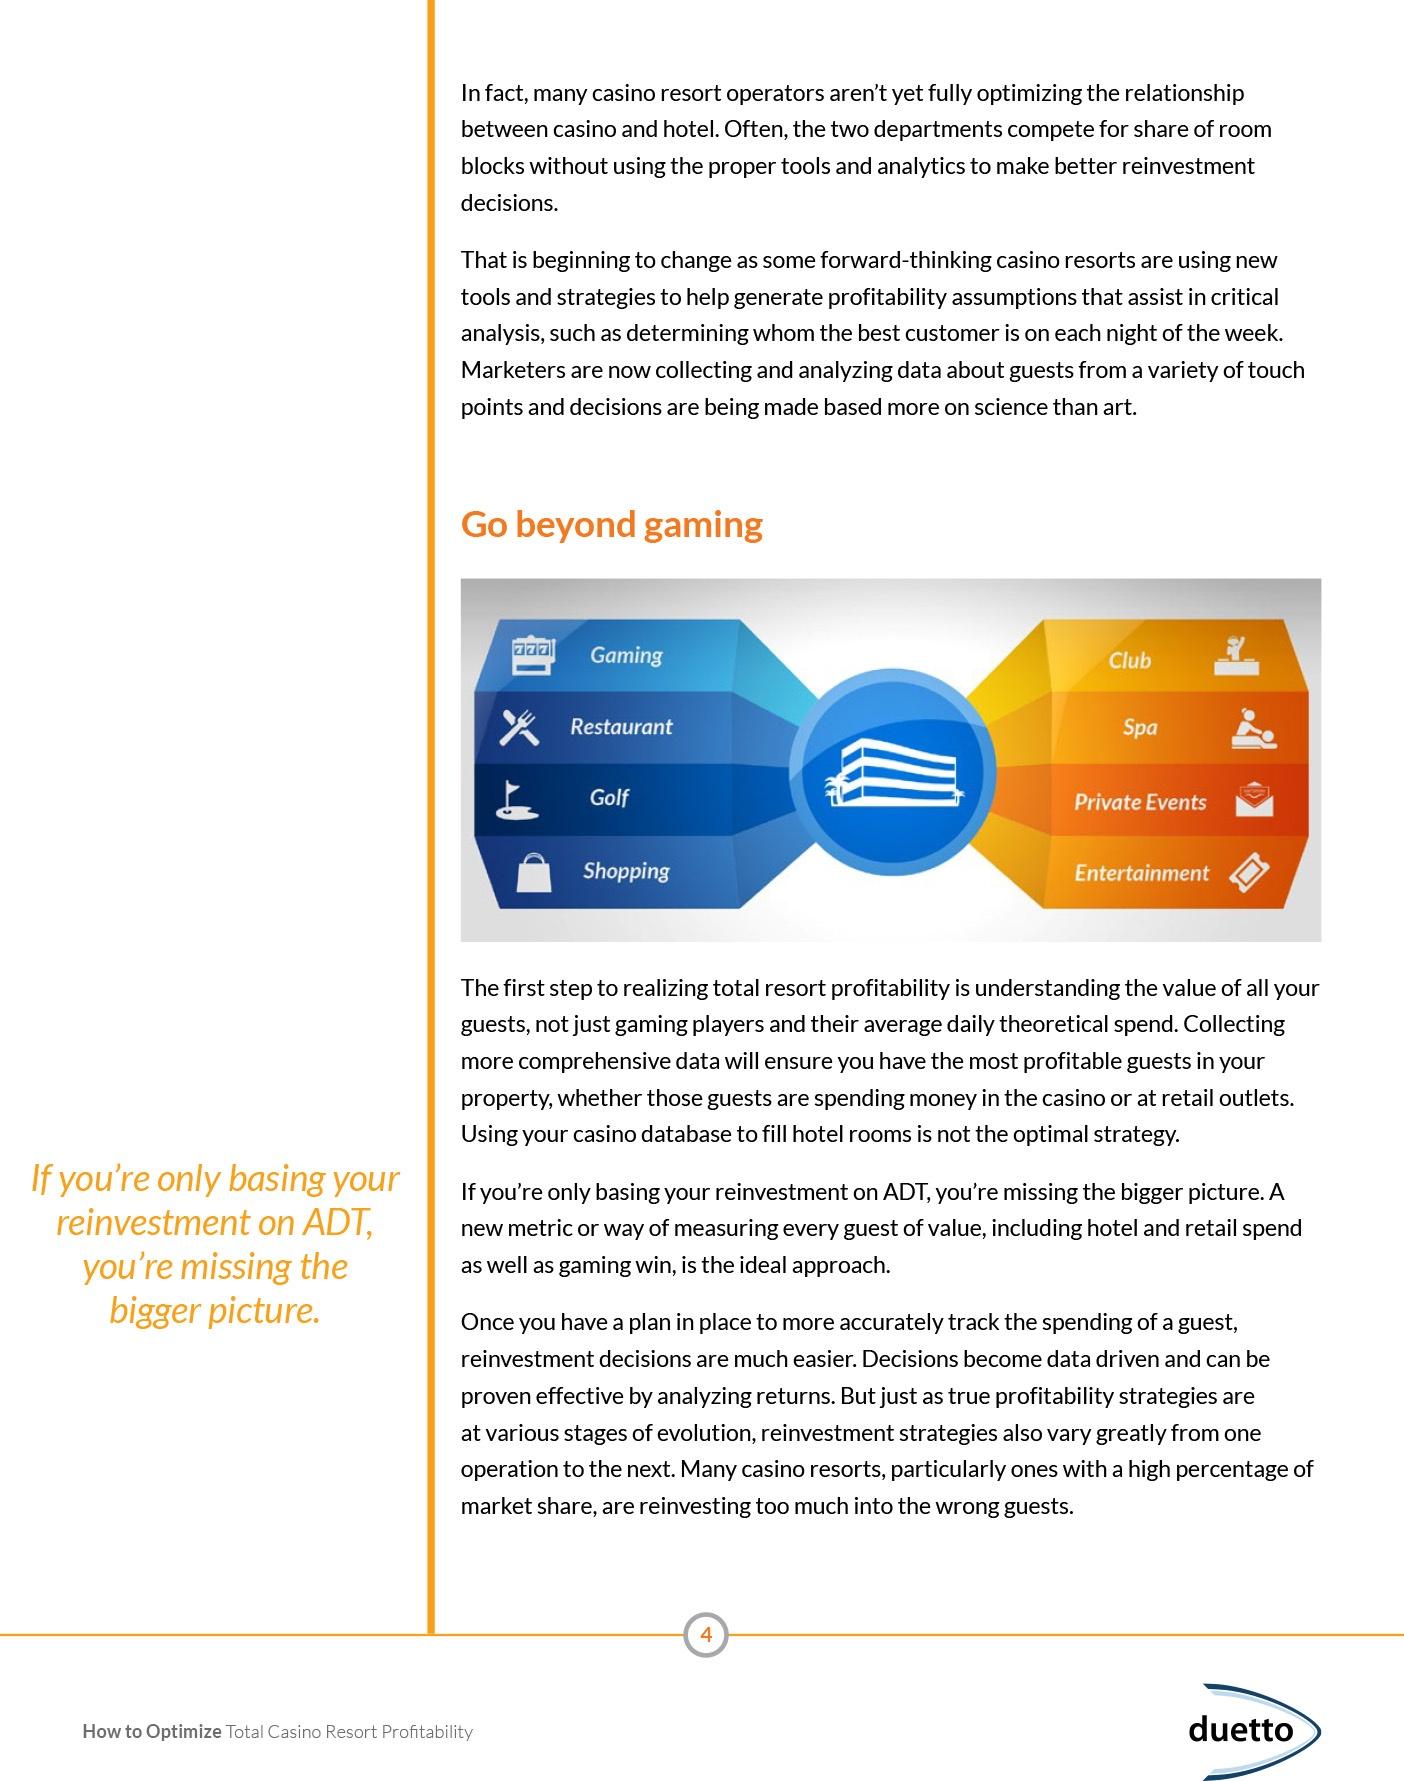 4How-to-Optimize-Casino-Profitability-4.jpg